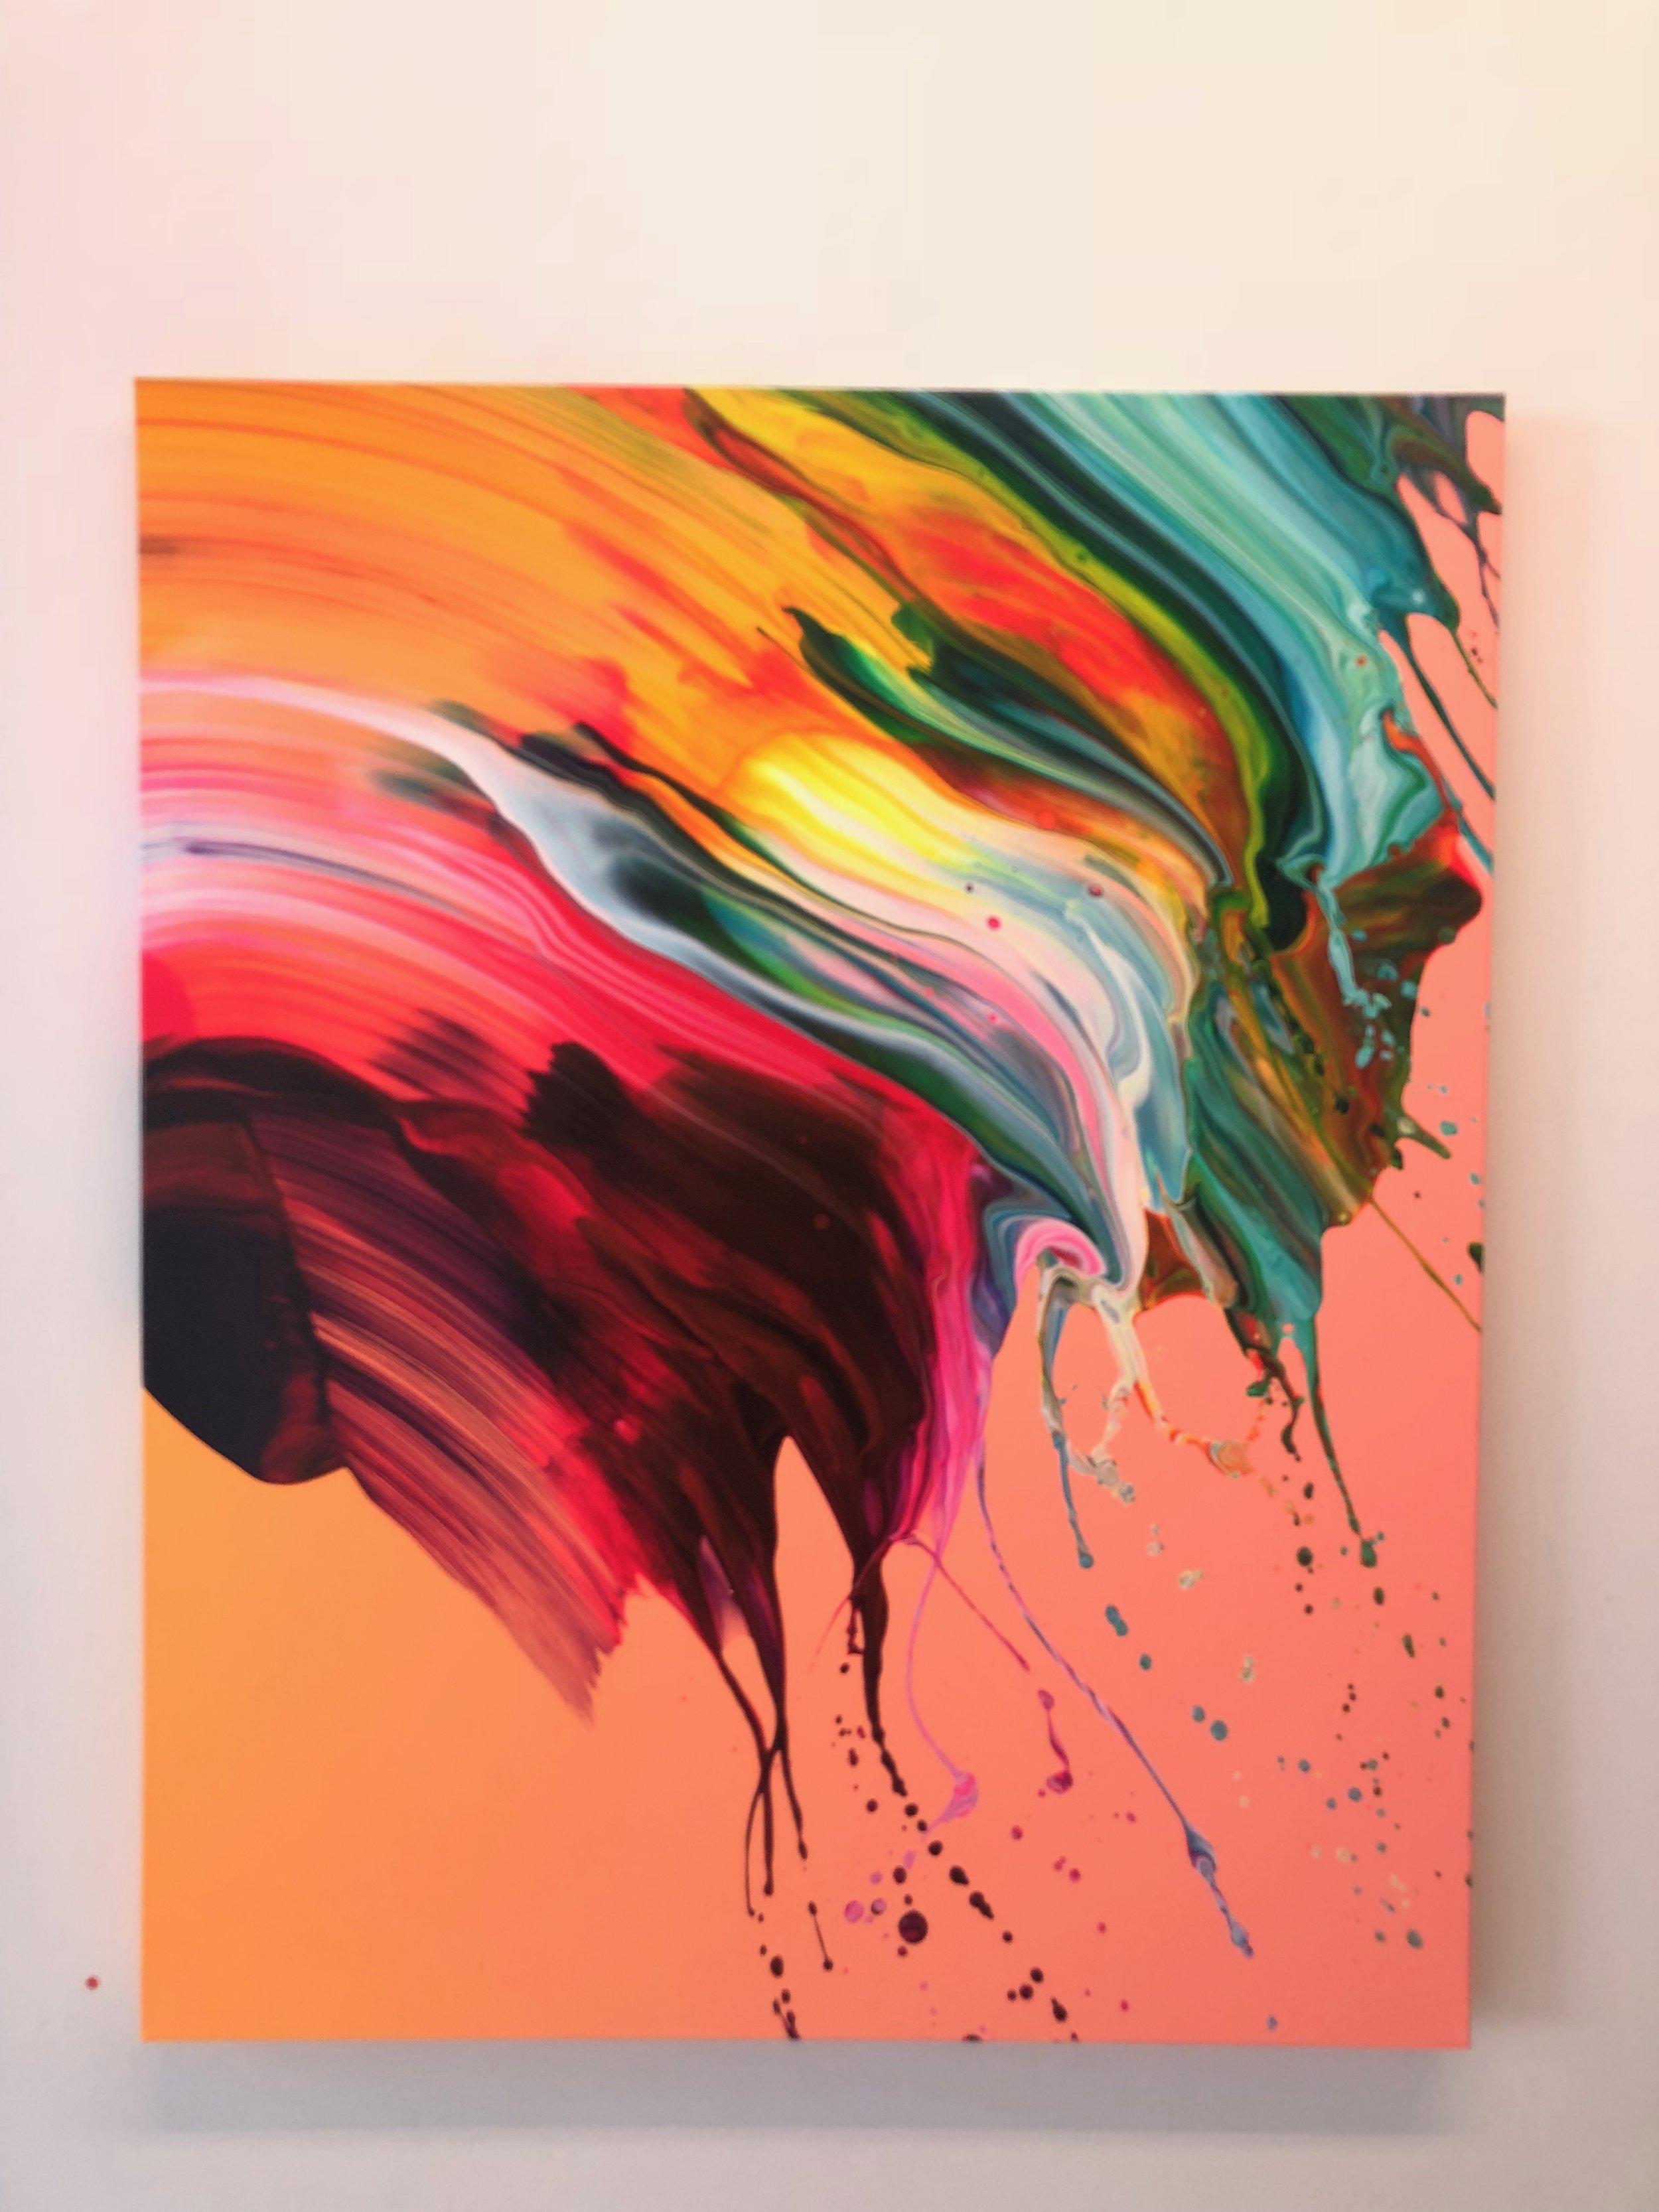 Yago Hortal's show at Galeria Senda